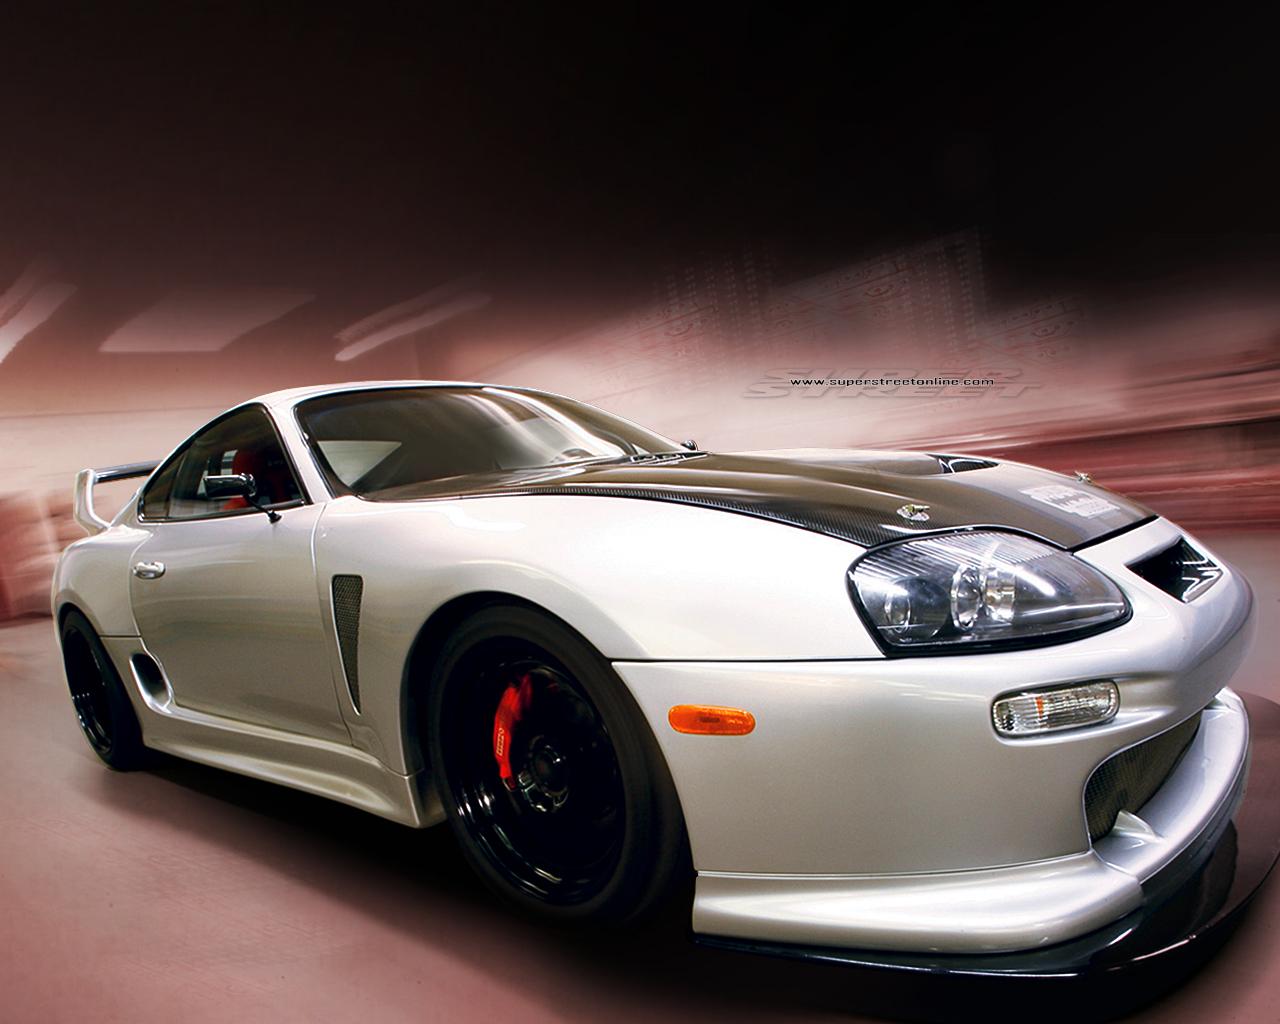 Luxury Cars Toyota Supra Cars Wallpaper 1280x1024